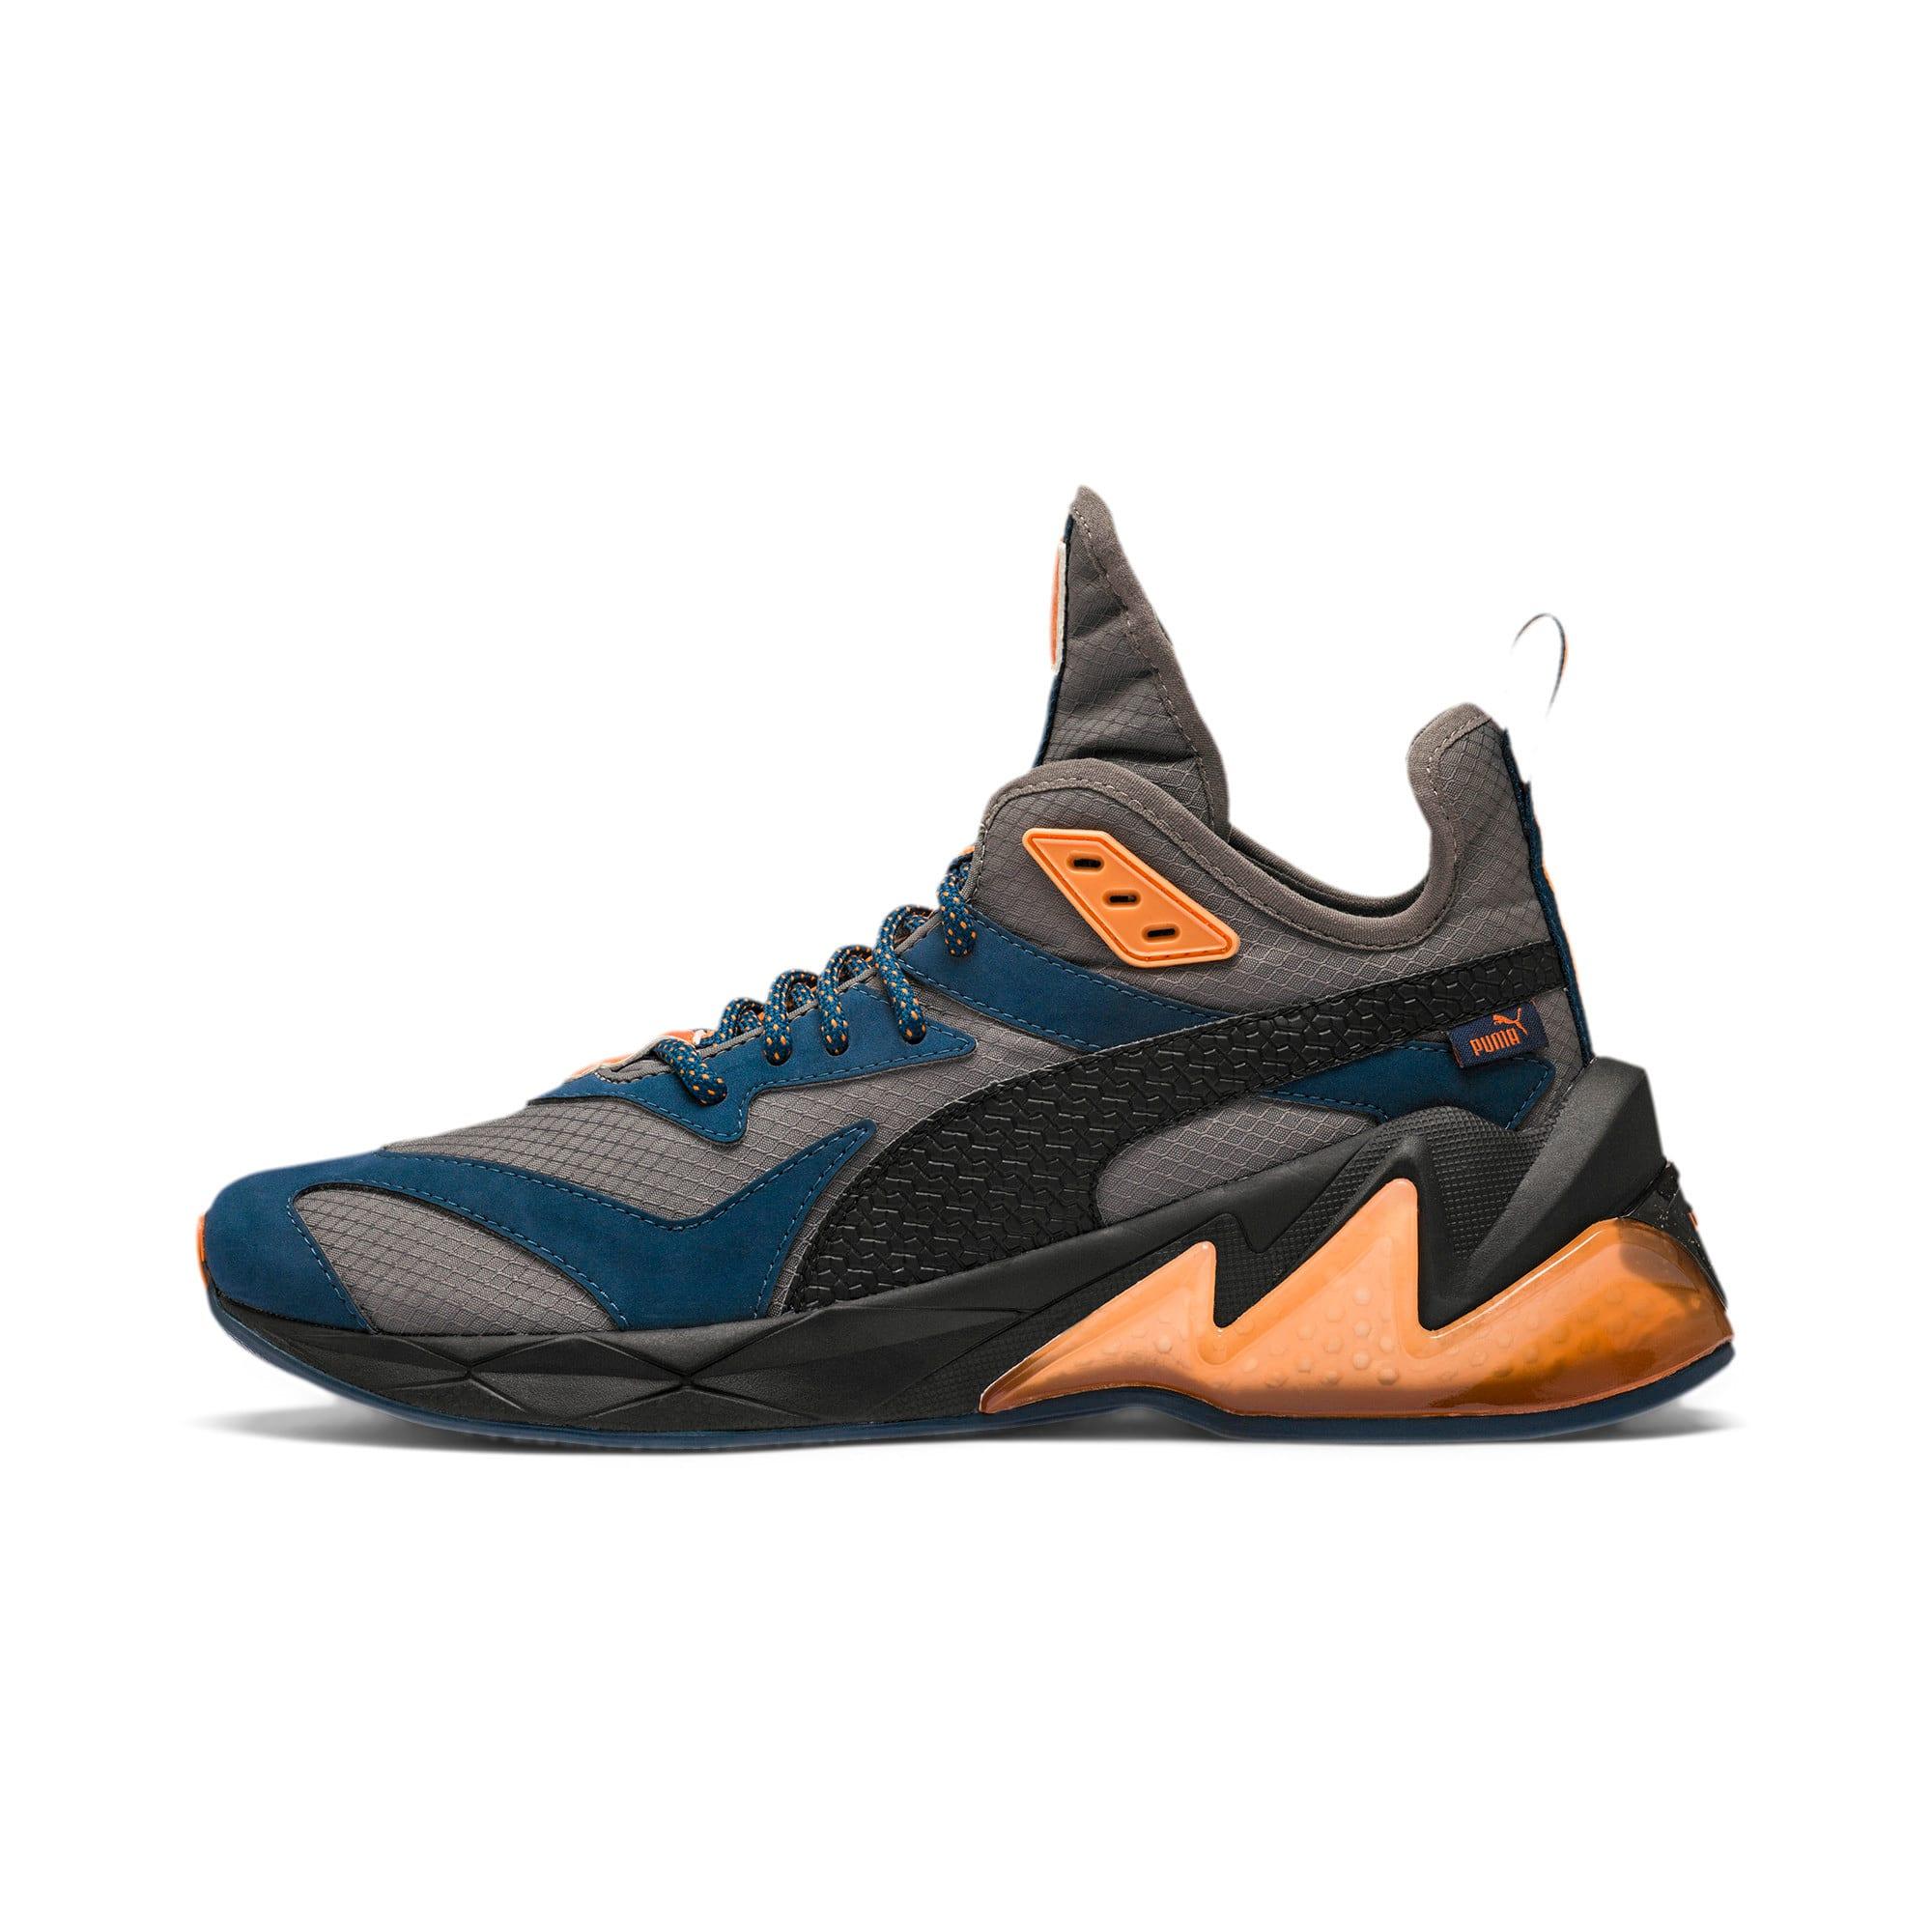 Thumbnail 1 of LQDCELL Origin Terrain Men's Shoes, CASTLEROCK-Puma Black, medium